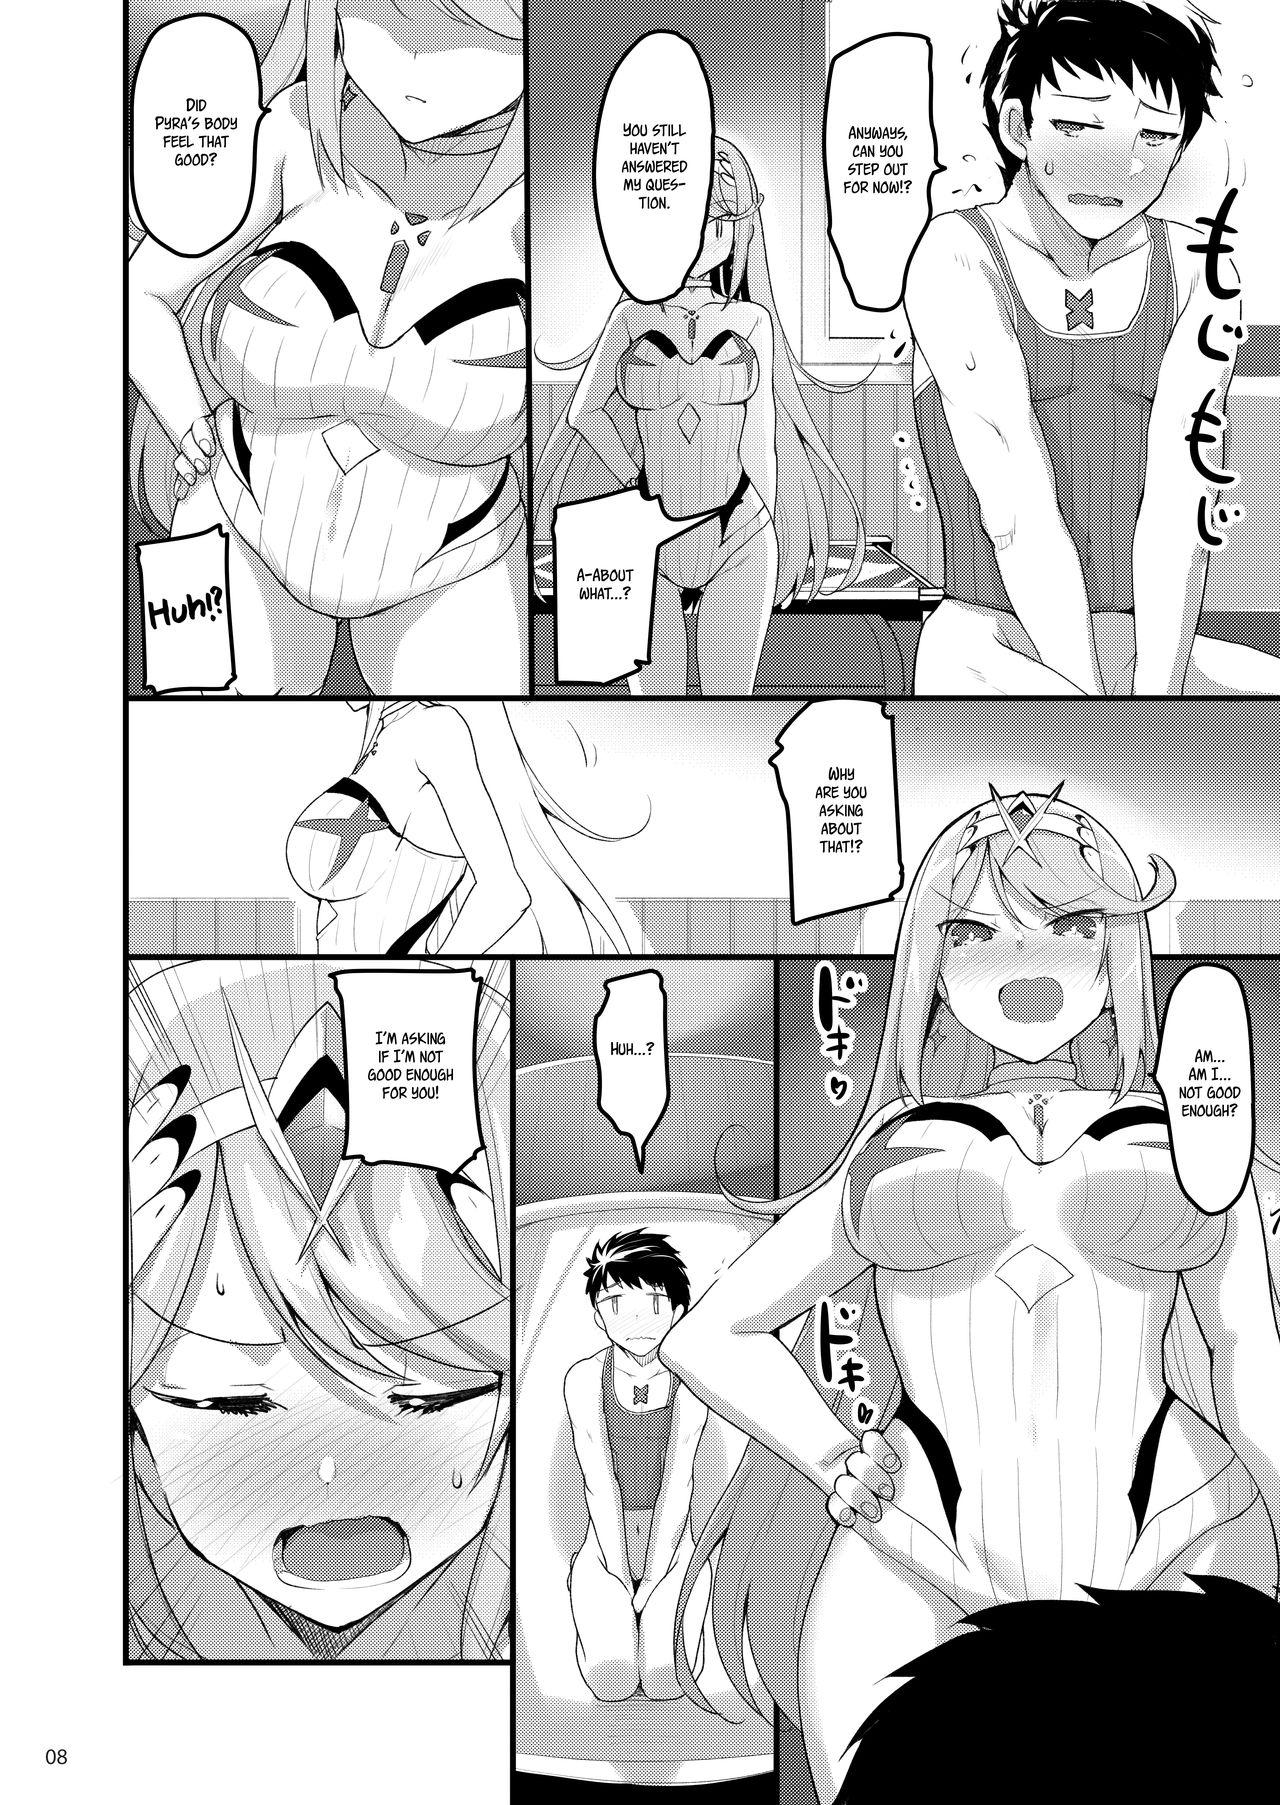 Superbia no Amai Yoru 2 | | Mor Ardain's Sweet Night 2 6